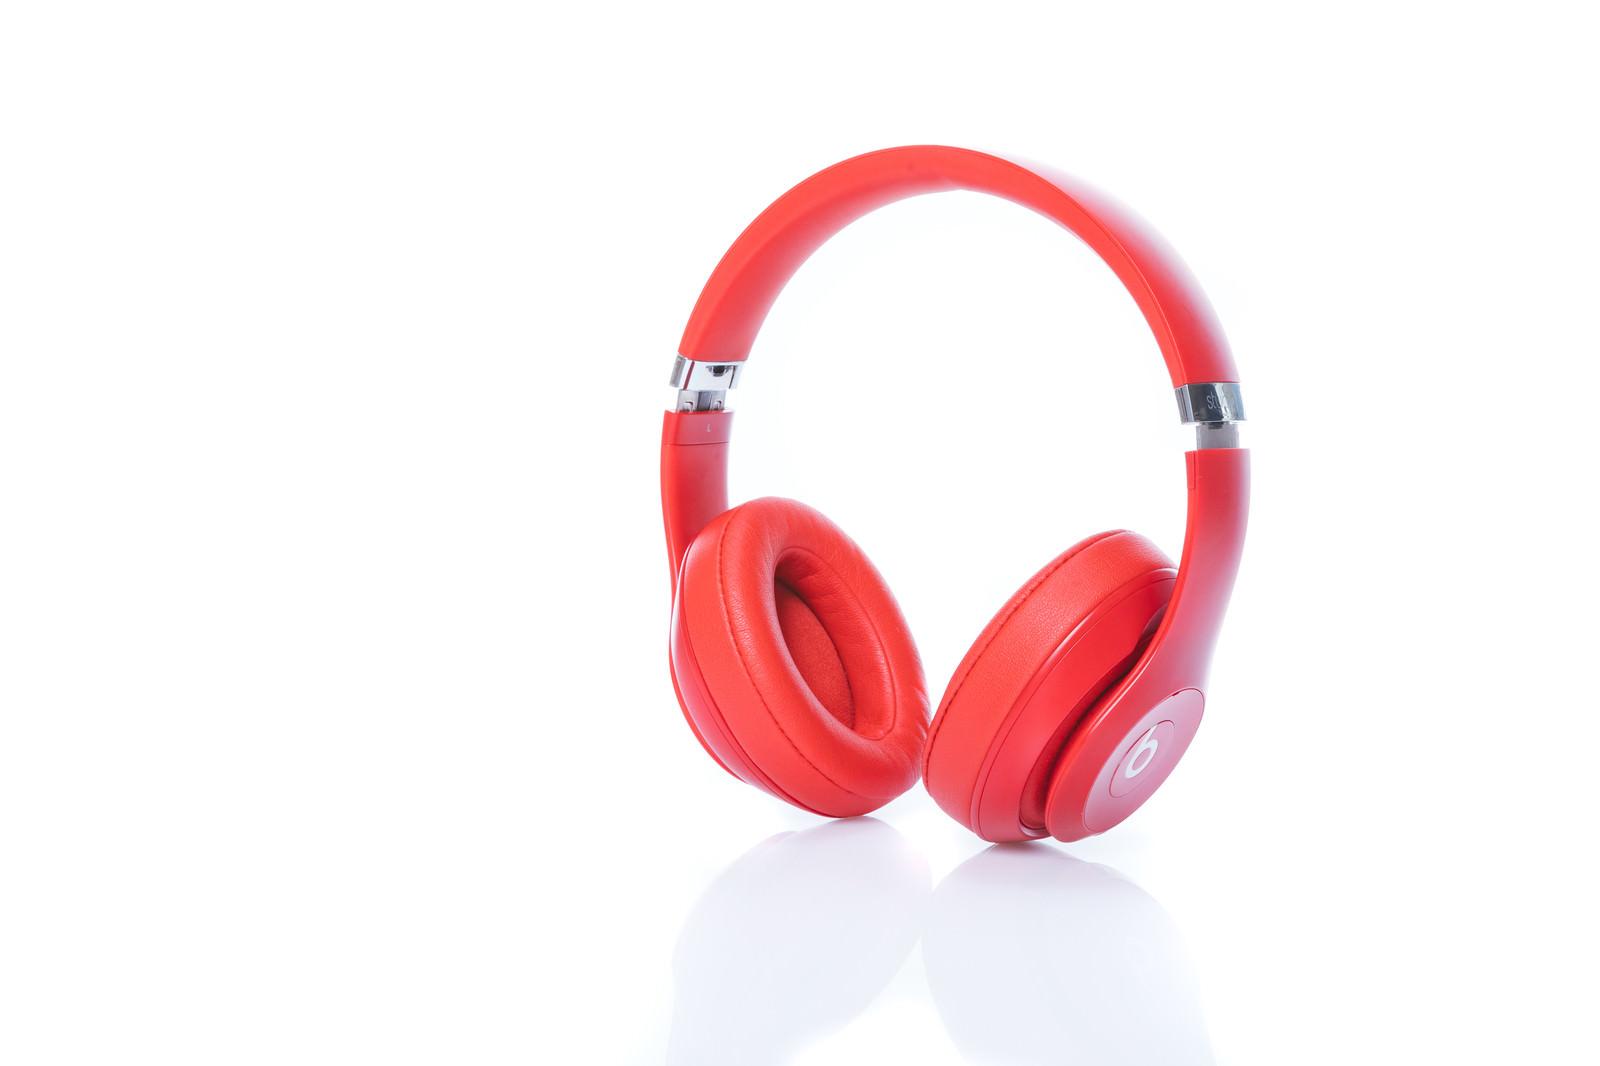 「Beats Studio3 Wireless」の写真